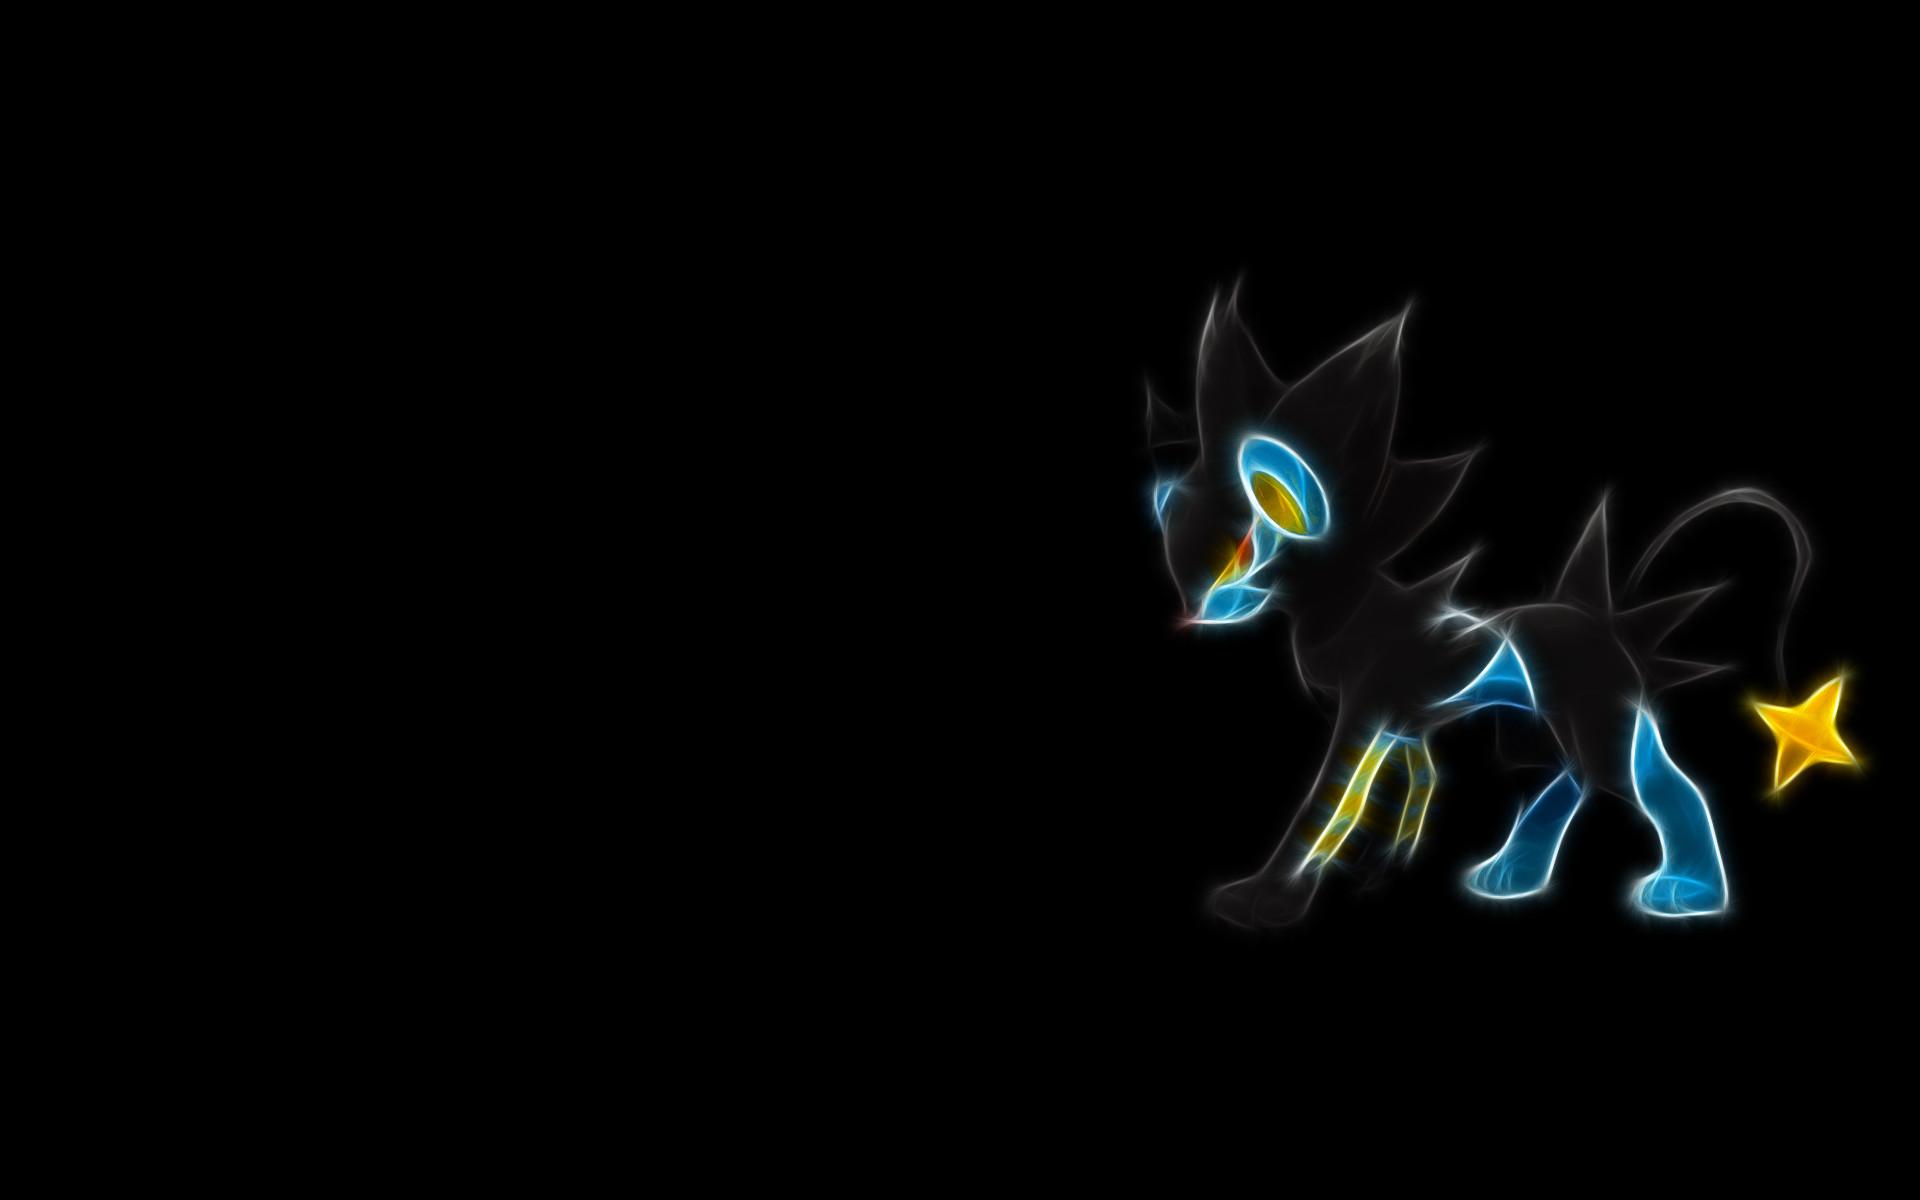 Pokemon Black Wallpapers – Full HD wallpaper search – page 2